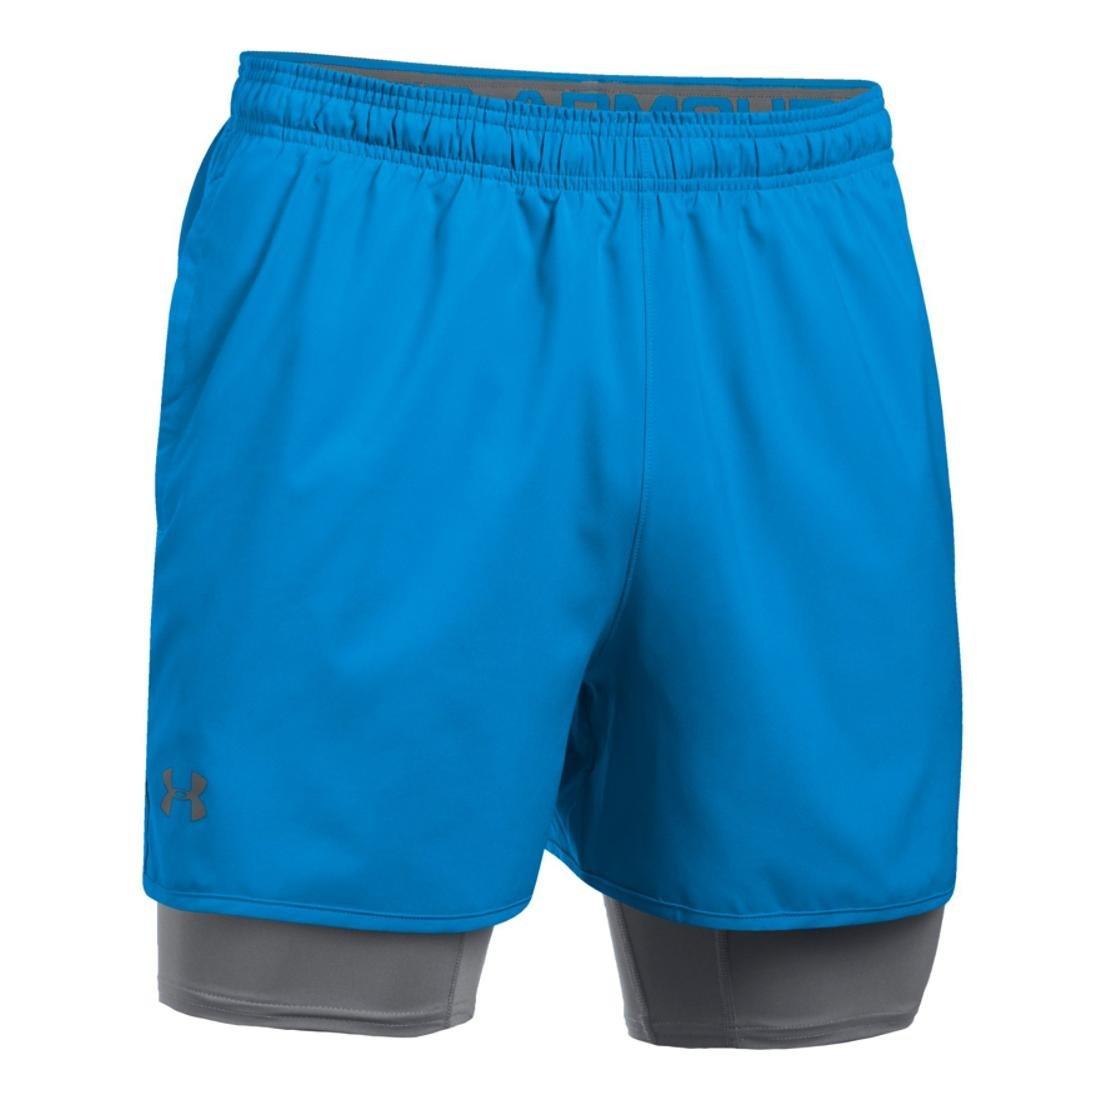 Under Armour Mens Qualifier 2-In-1 Shorts